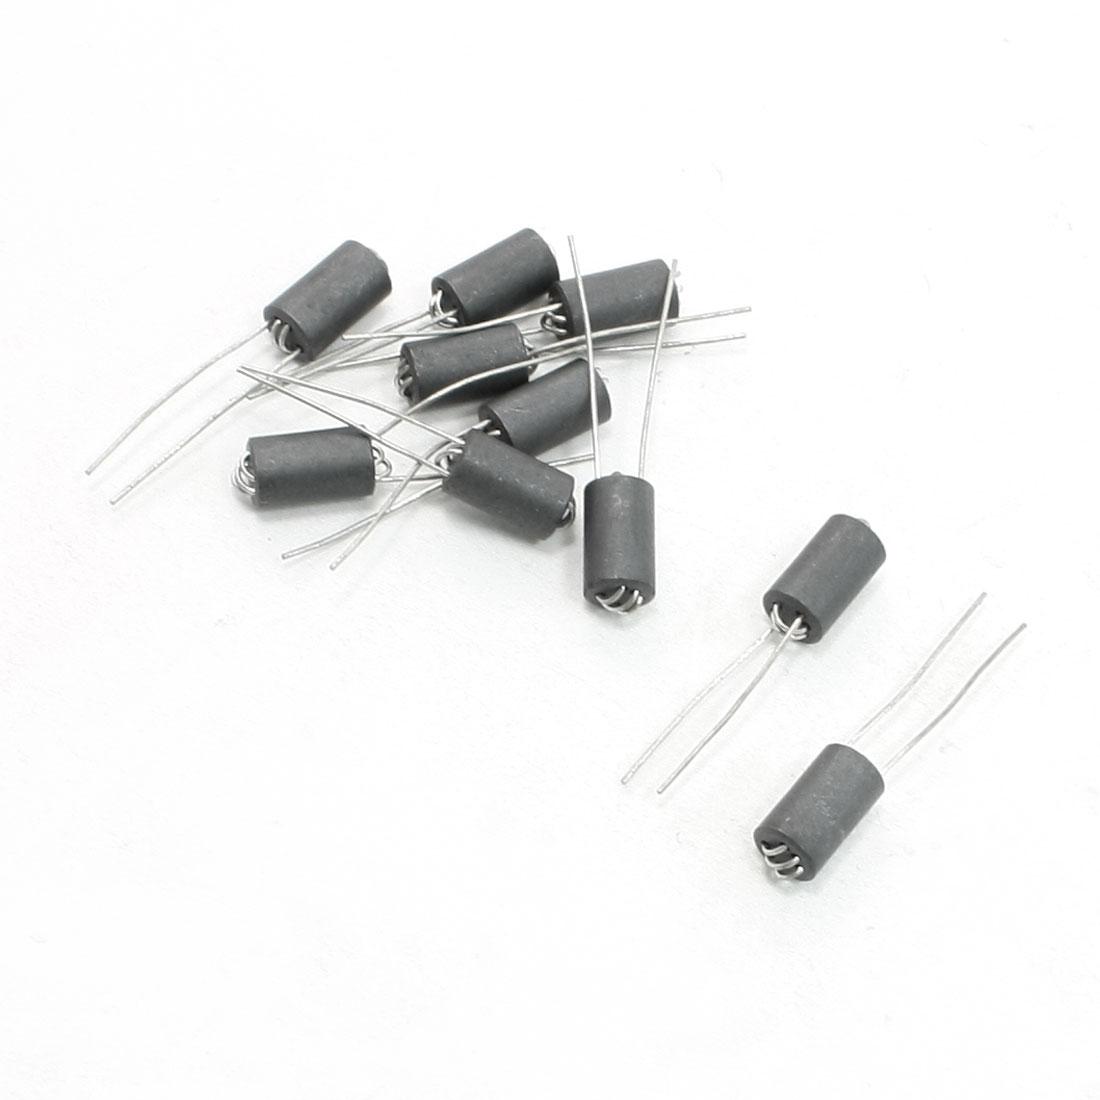 6mm x 10mm x 0.8mm Axial Lead 6 Channel Ferrite Beads Inductors 10 Pcs